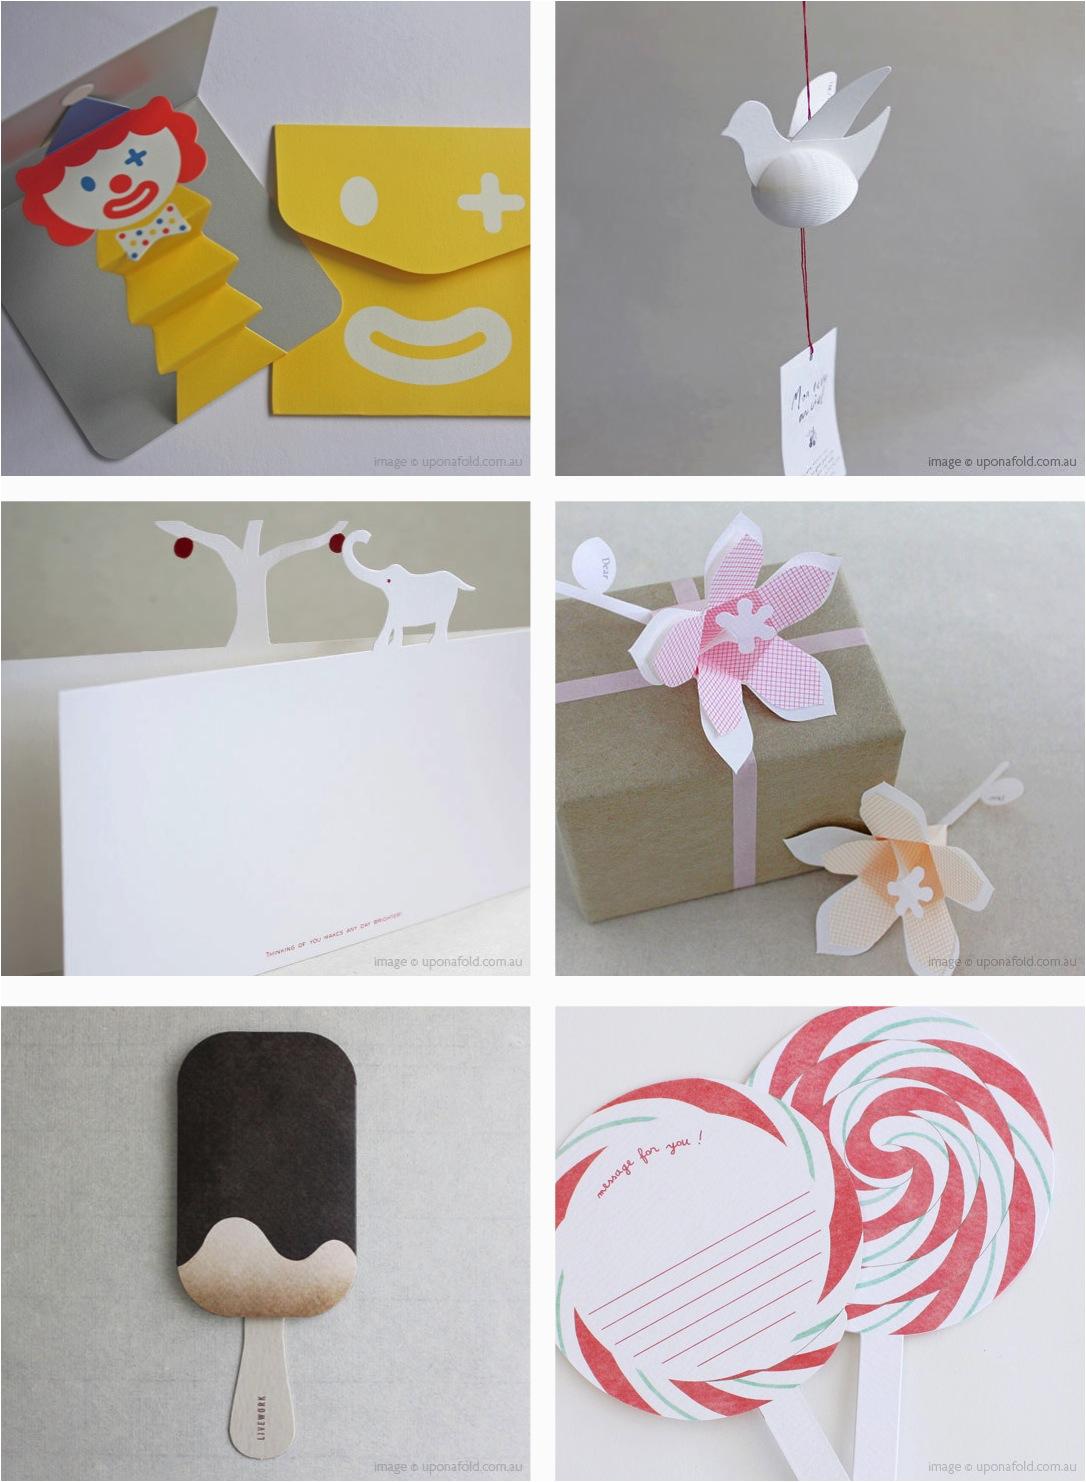 ebabee likes fun birthday cards for kids